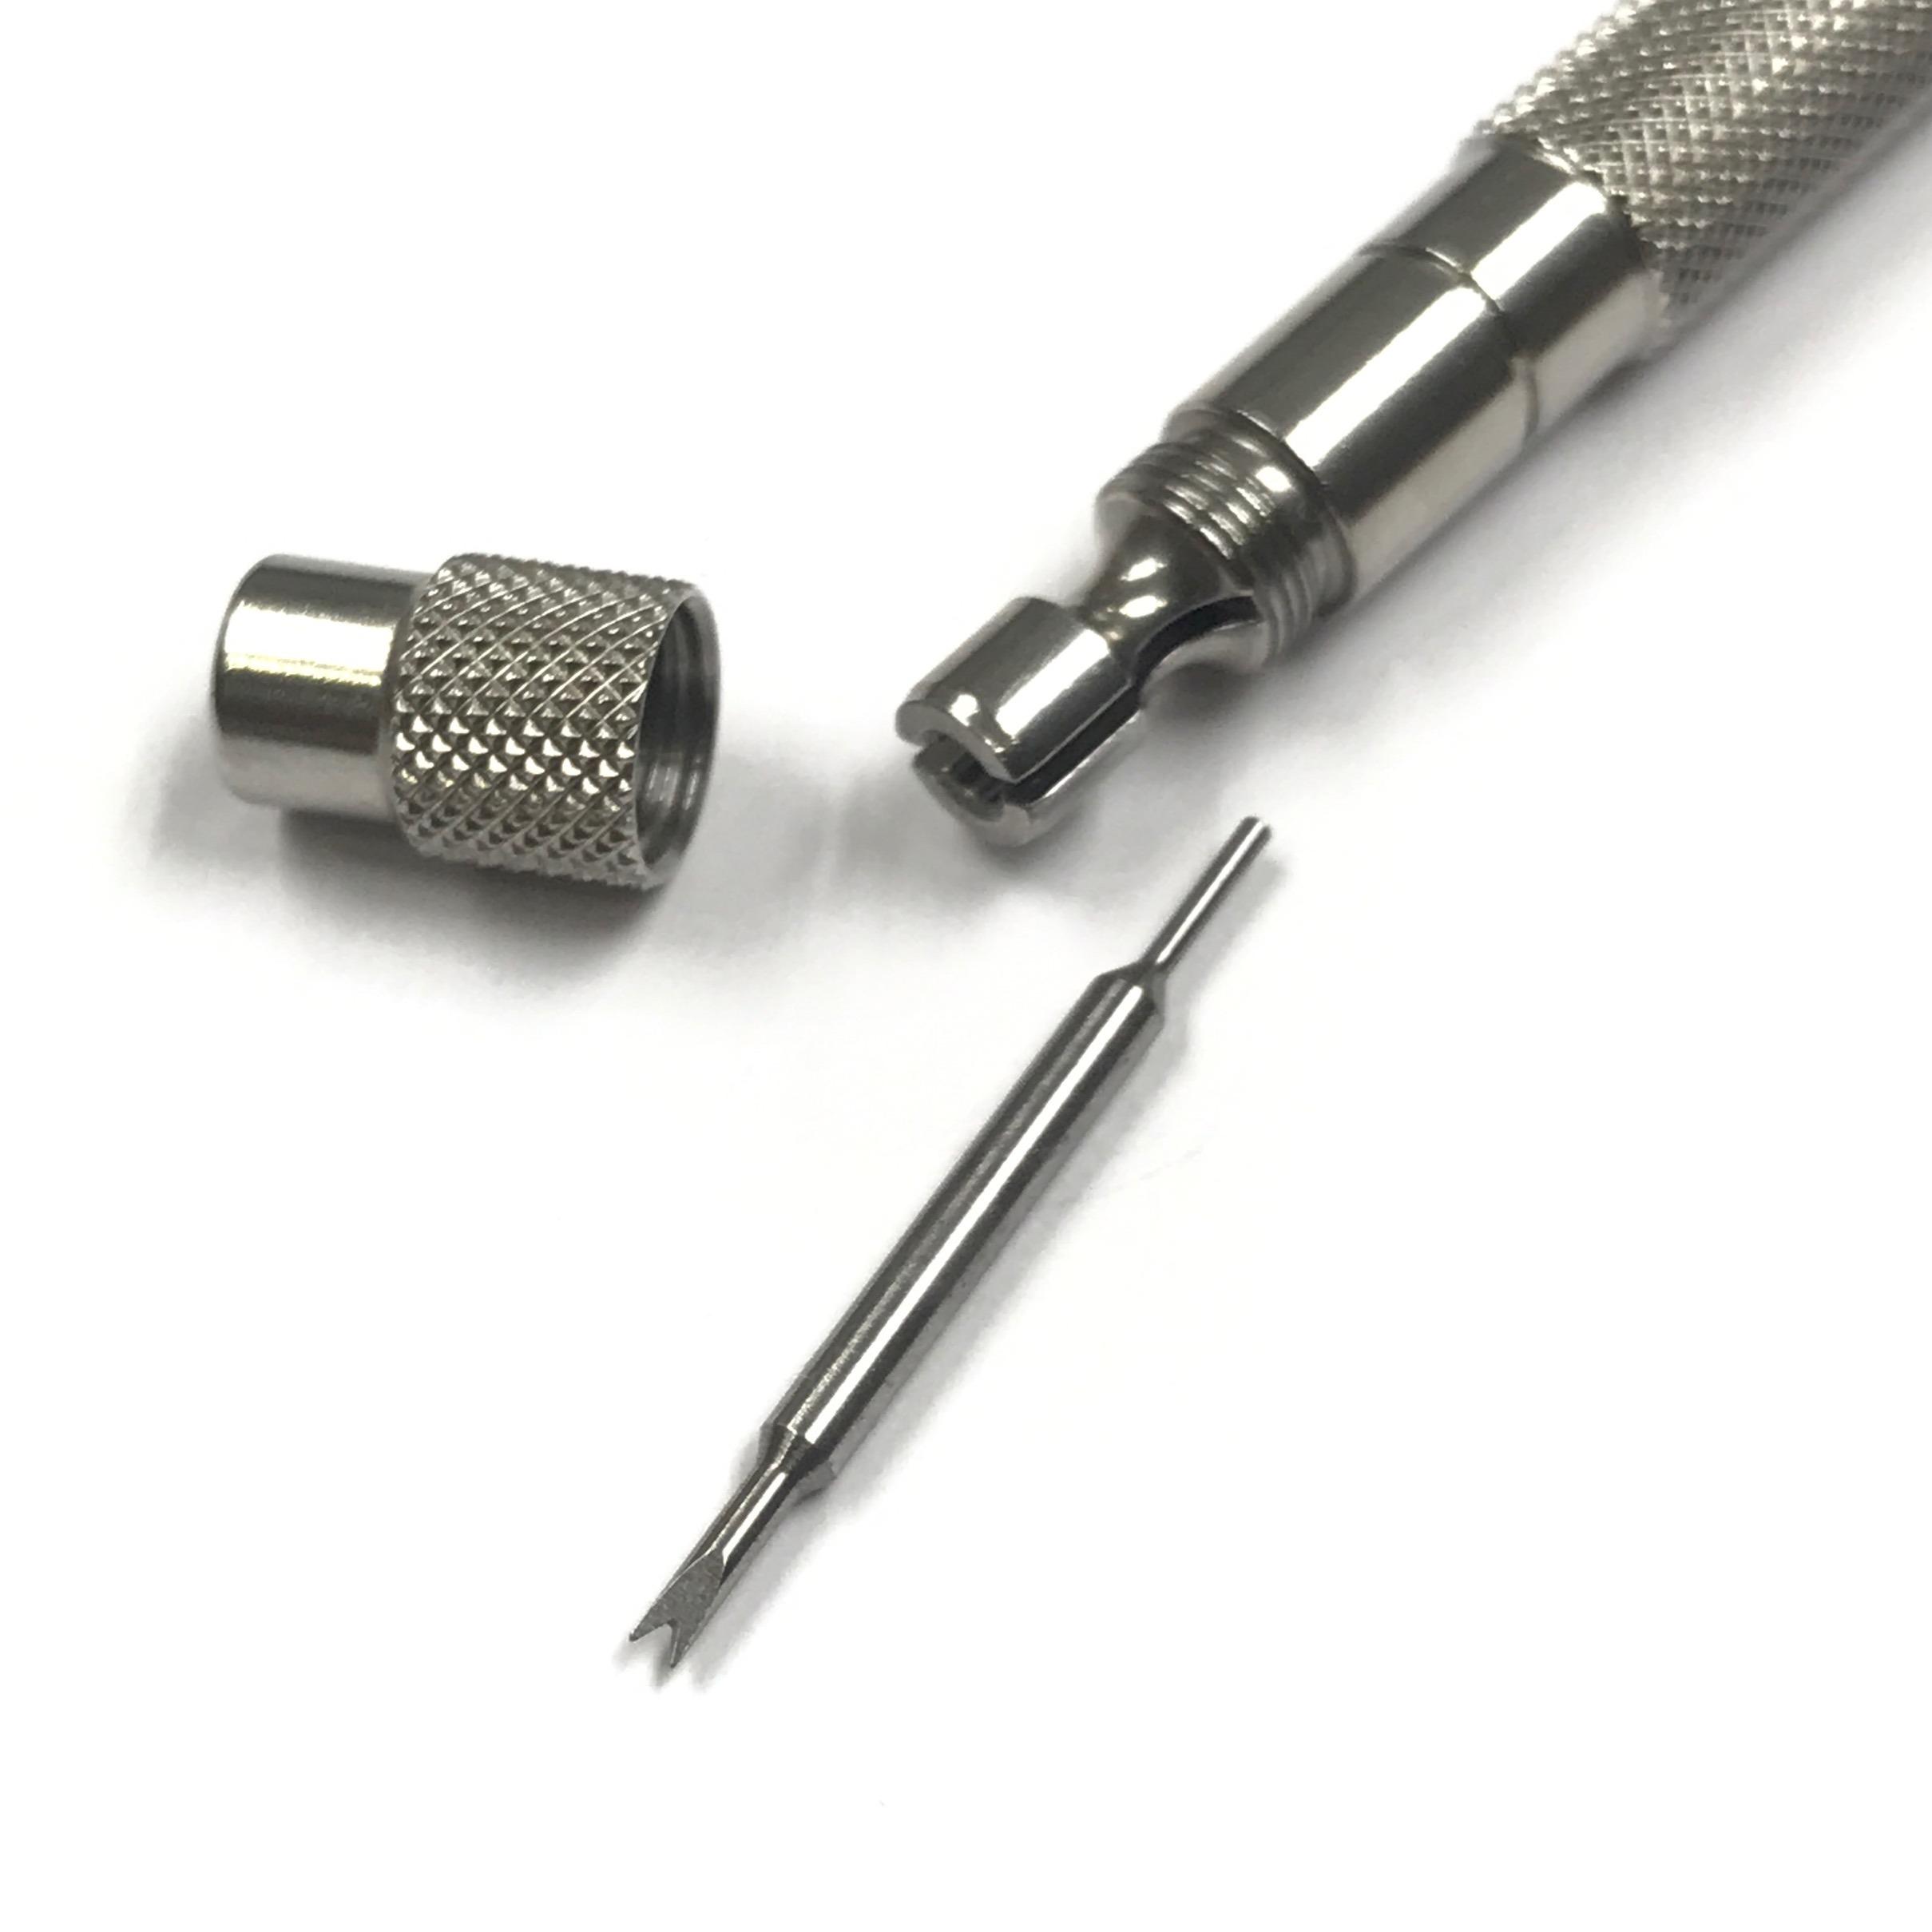 Springbar Tool Watch Strap Pin Remover